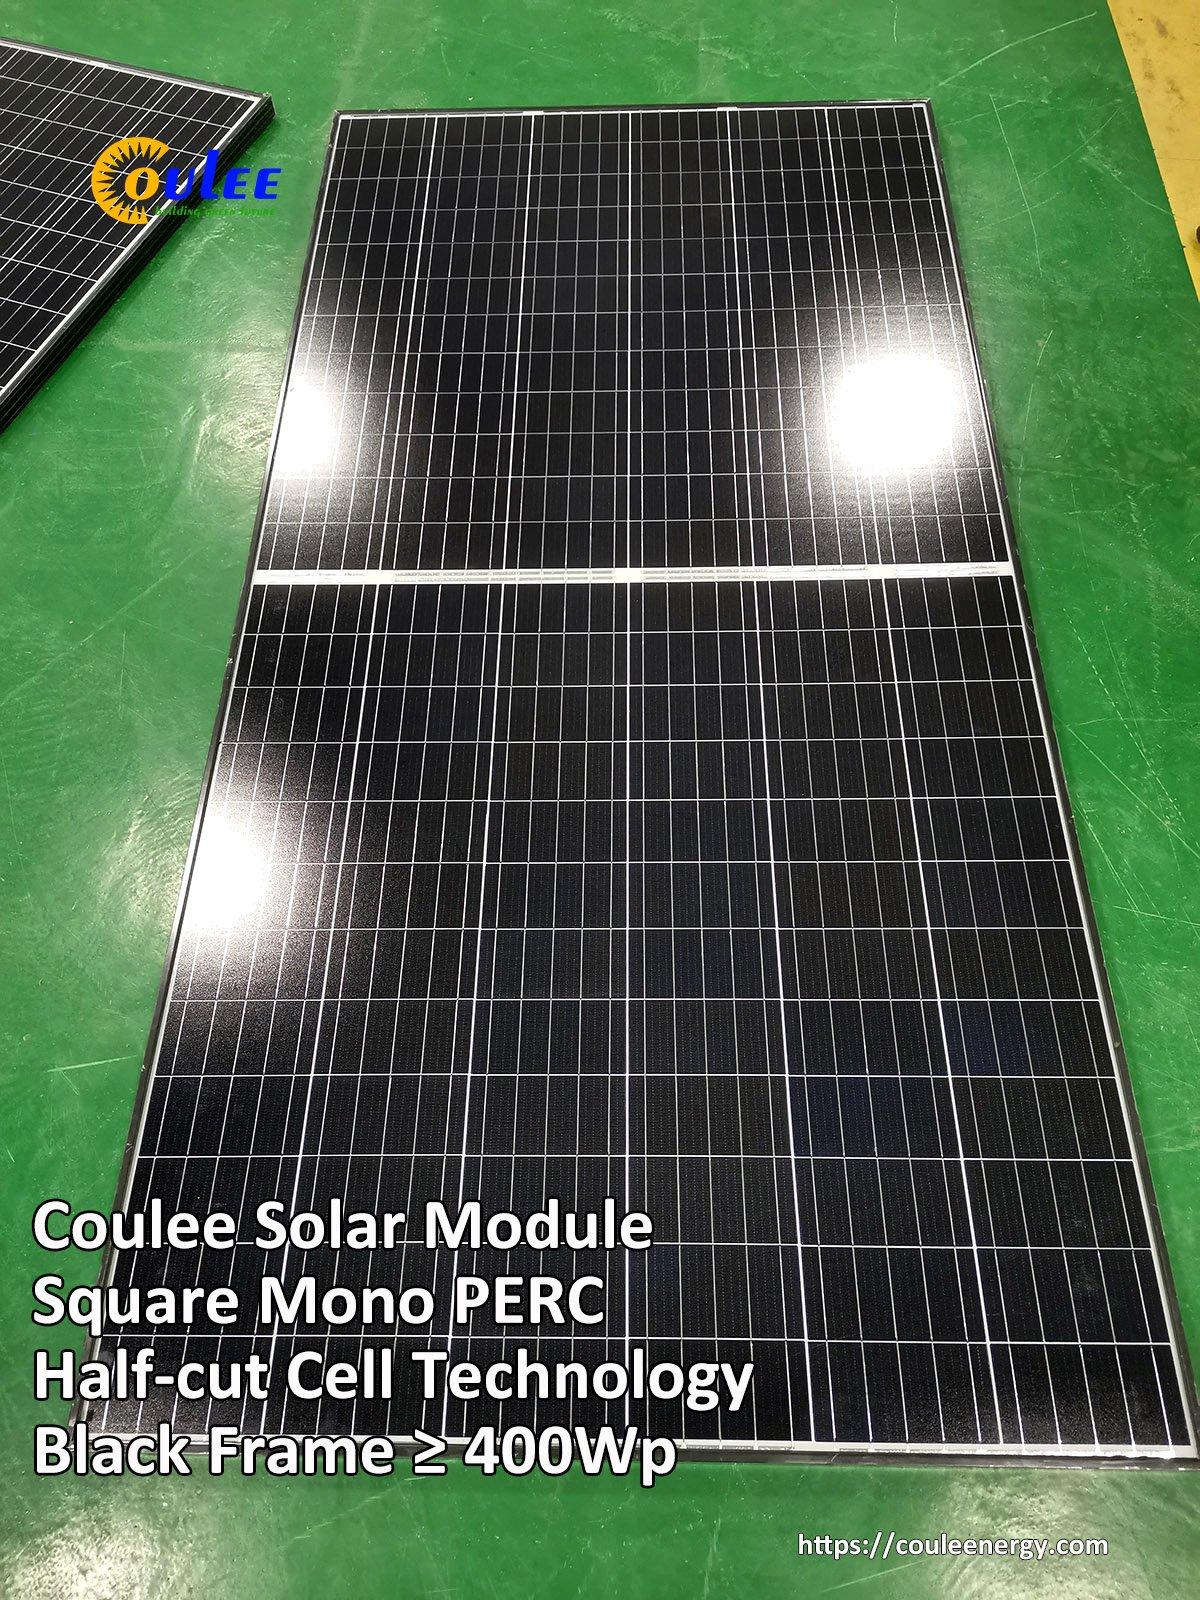 Black Frame Mono PERC Solar Module 400Wp